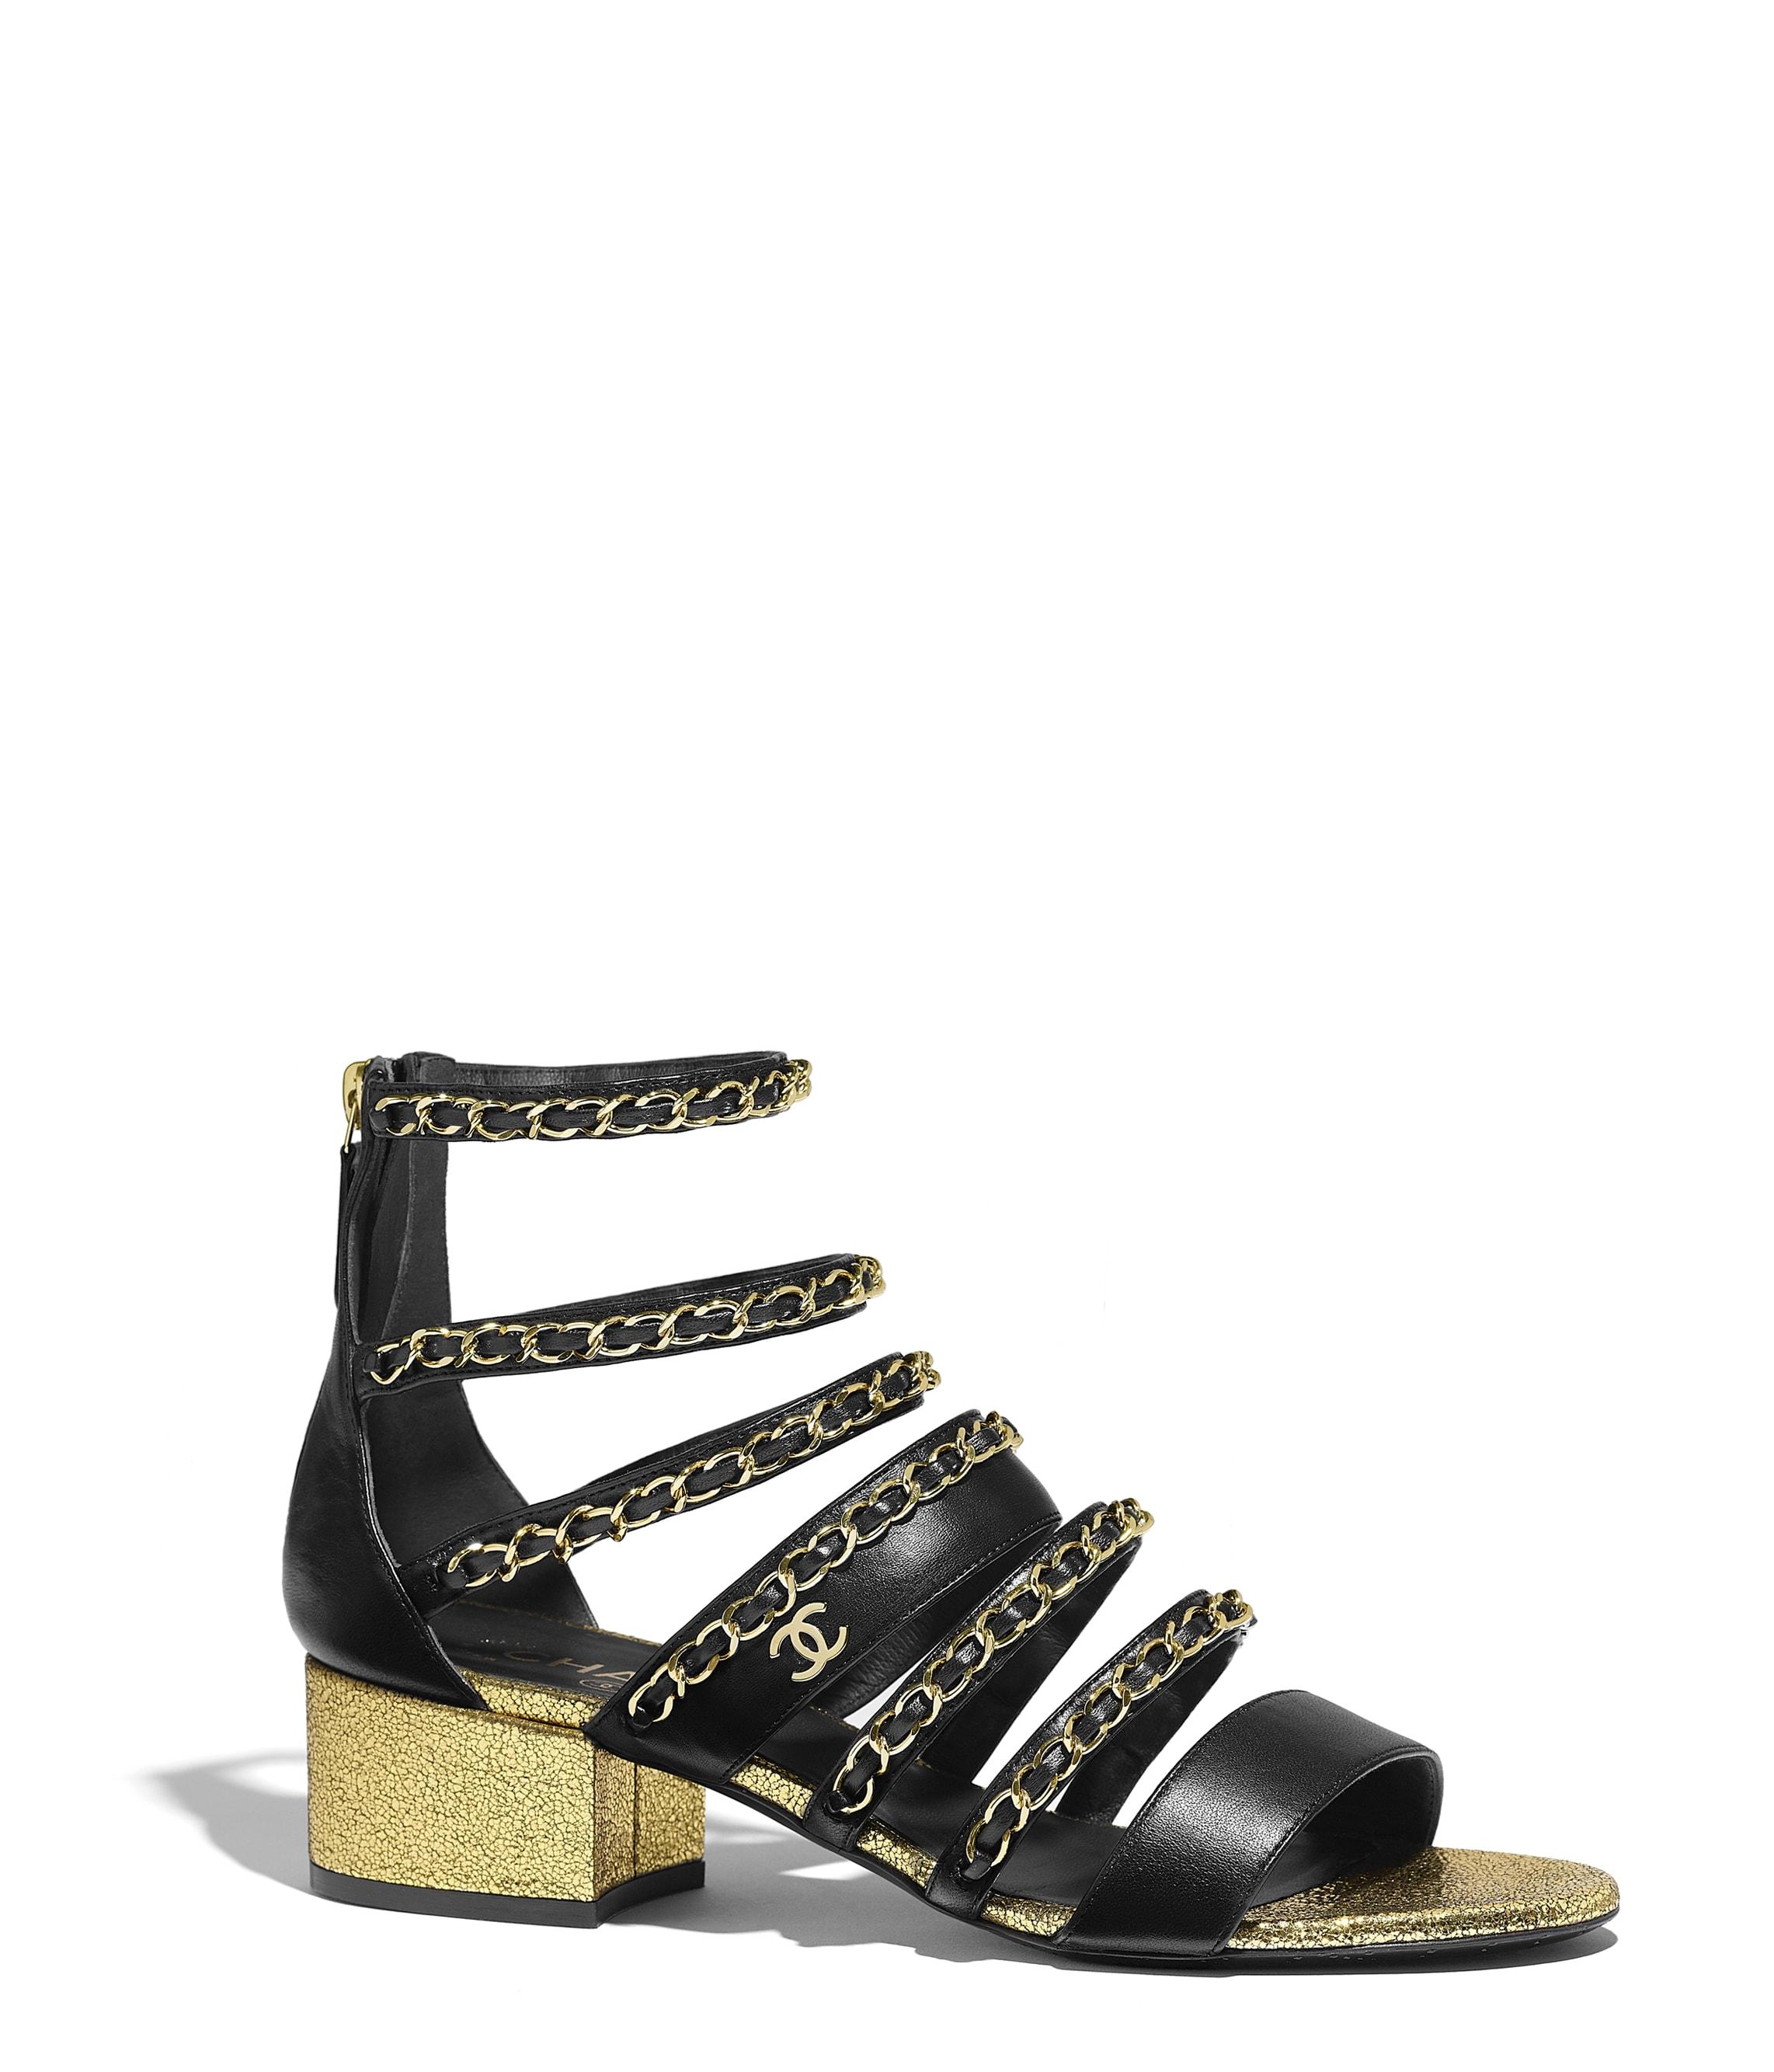 f745c3a066 Sandals - Shoes - CHANEL